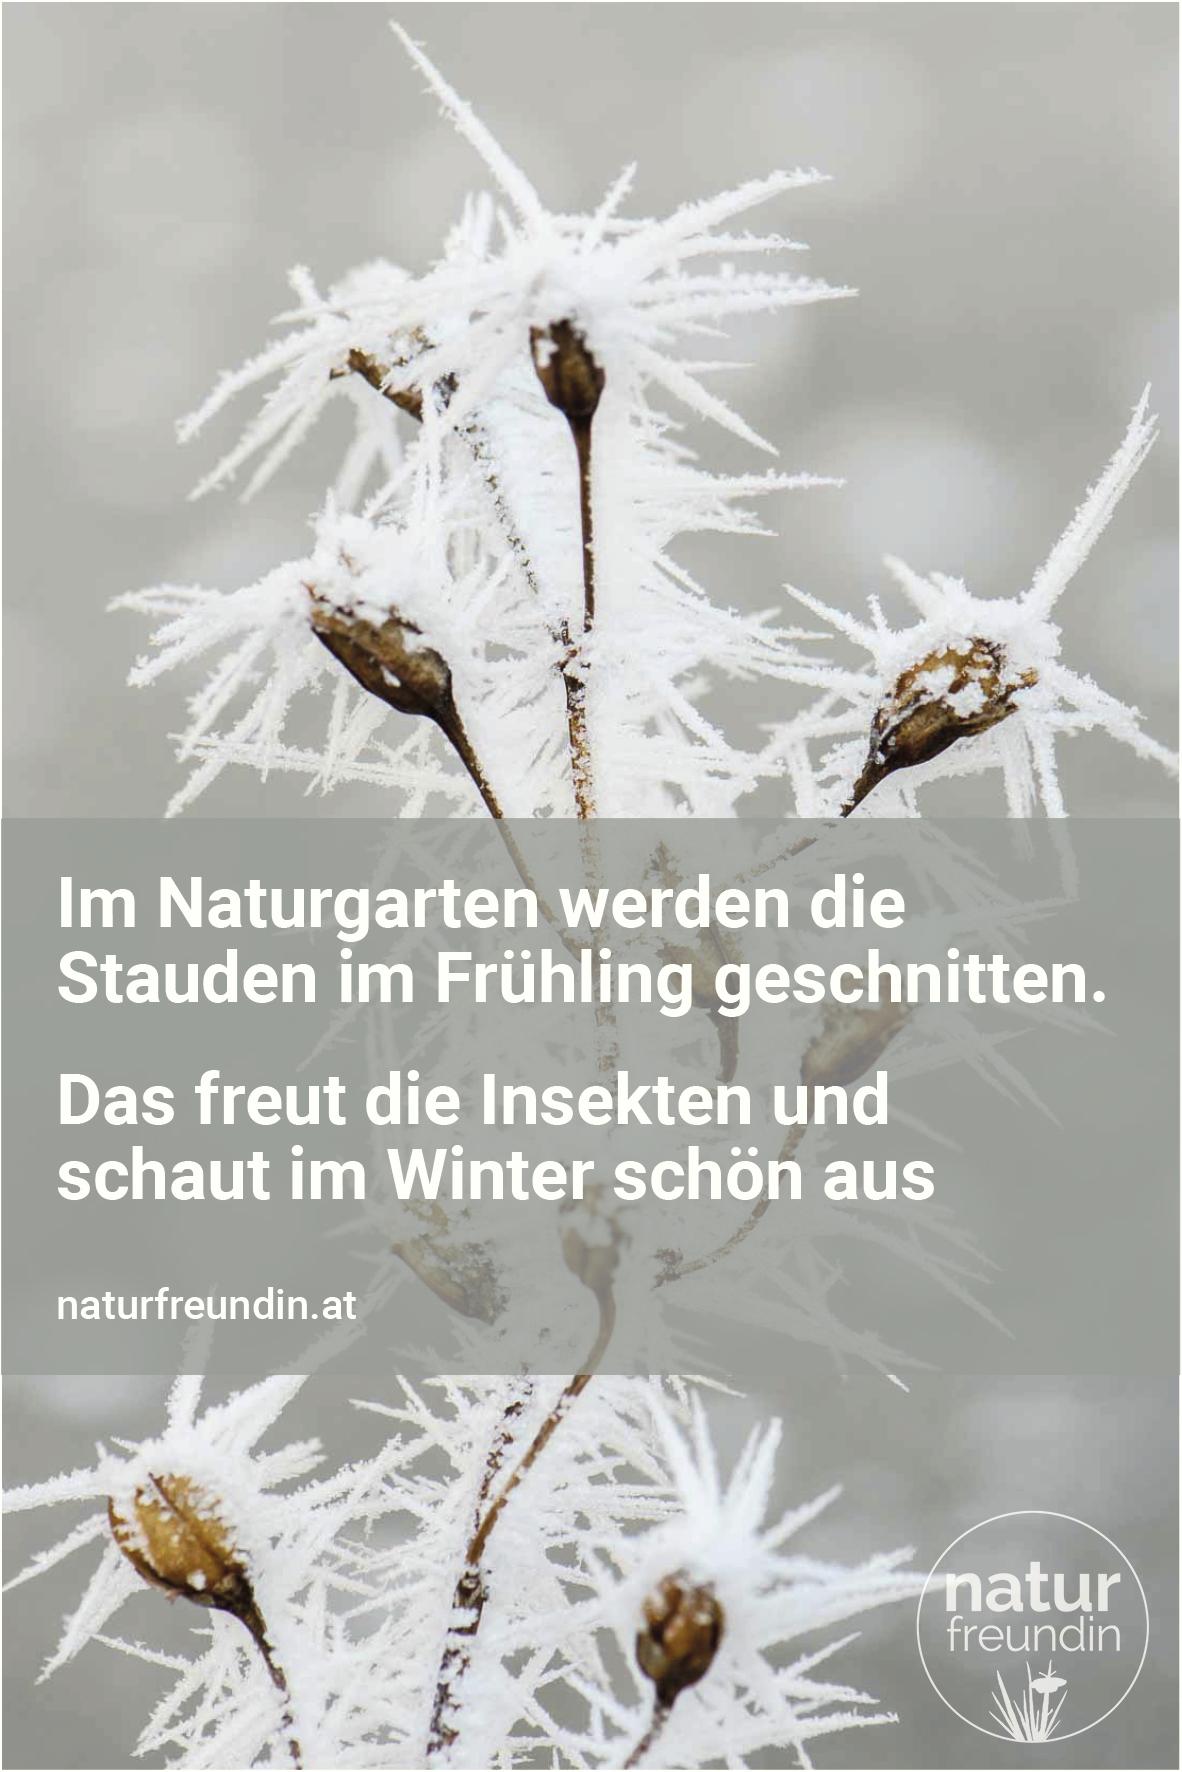 Naturgarten im Winter - Stauden werden erst im Frühling geschnitten.